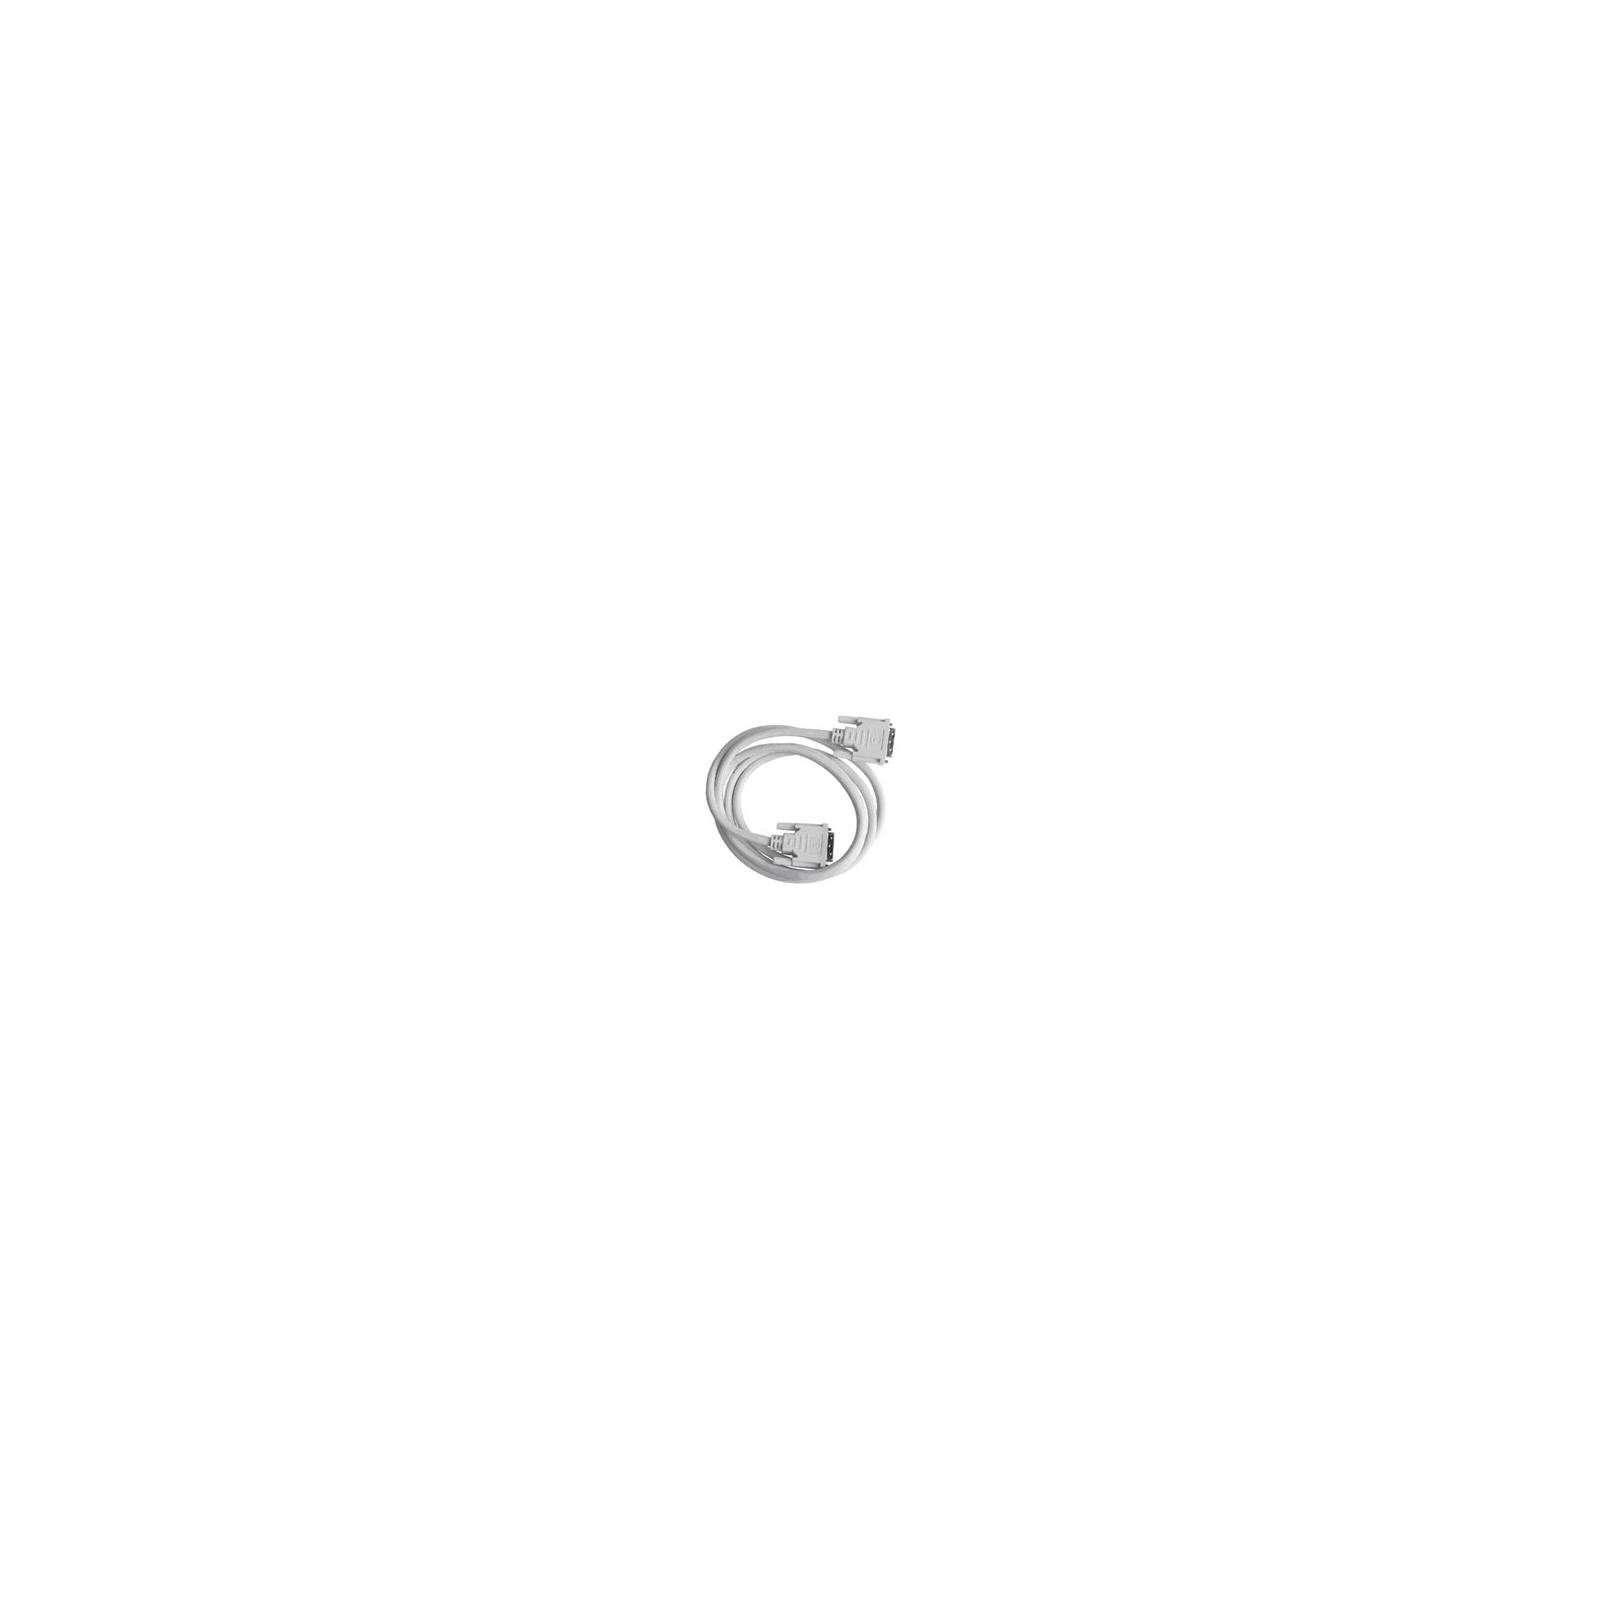 Кабель мультимедийный DVI to DVI 24pin, 3.0m Cablexpert (CC-DVI2-10)